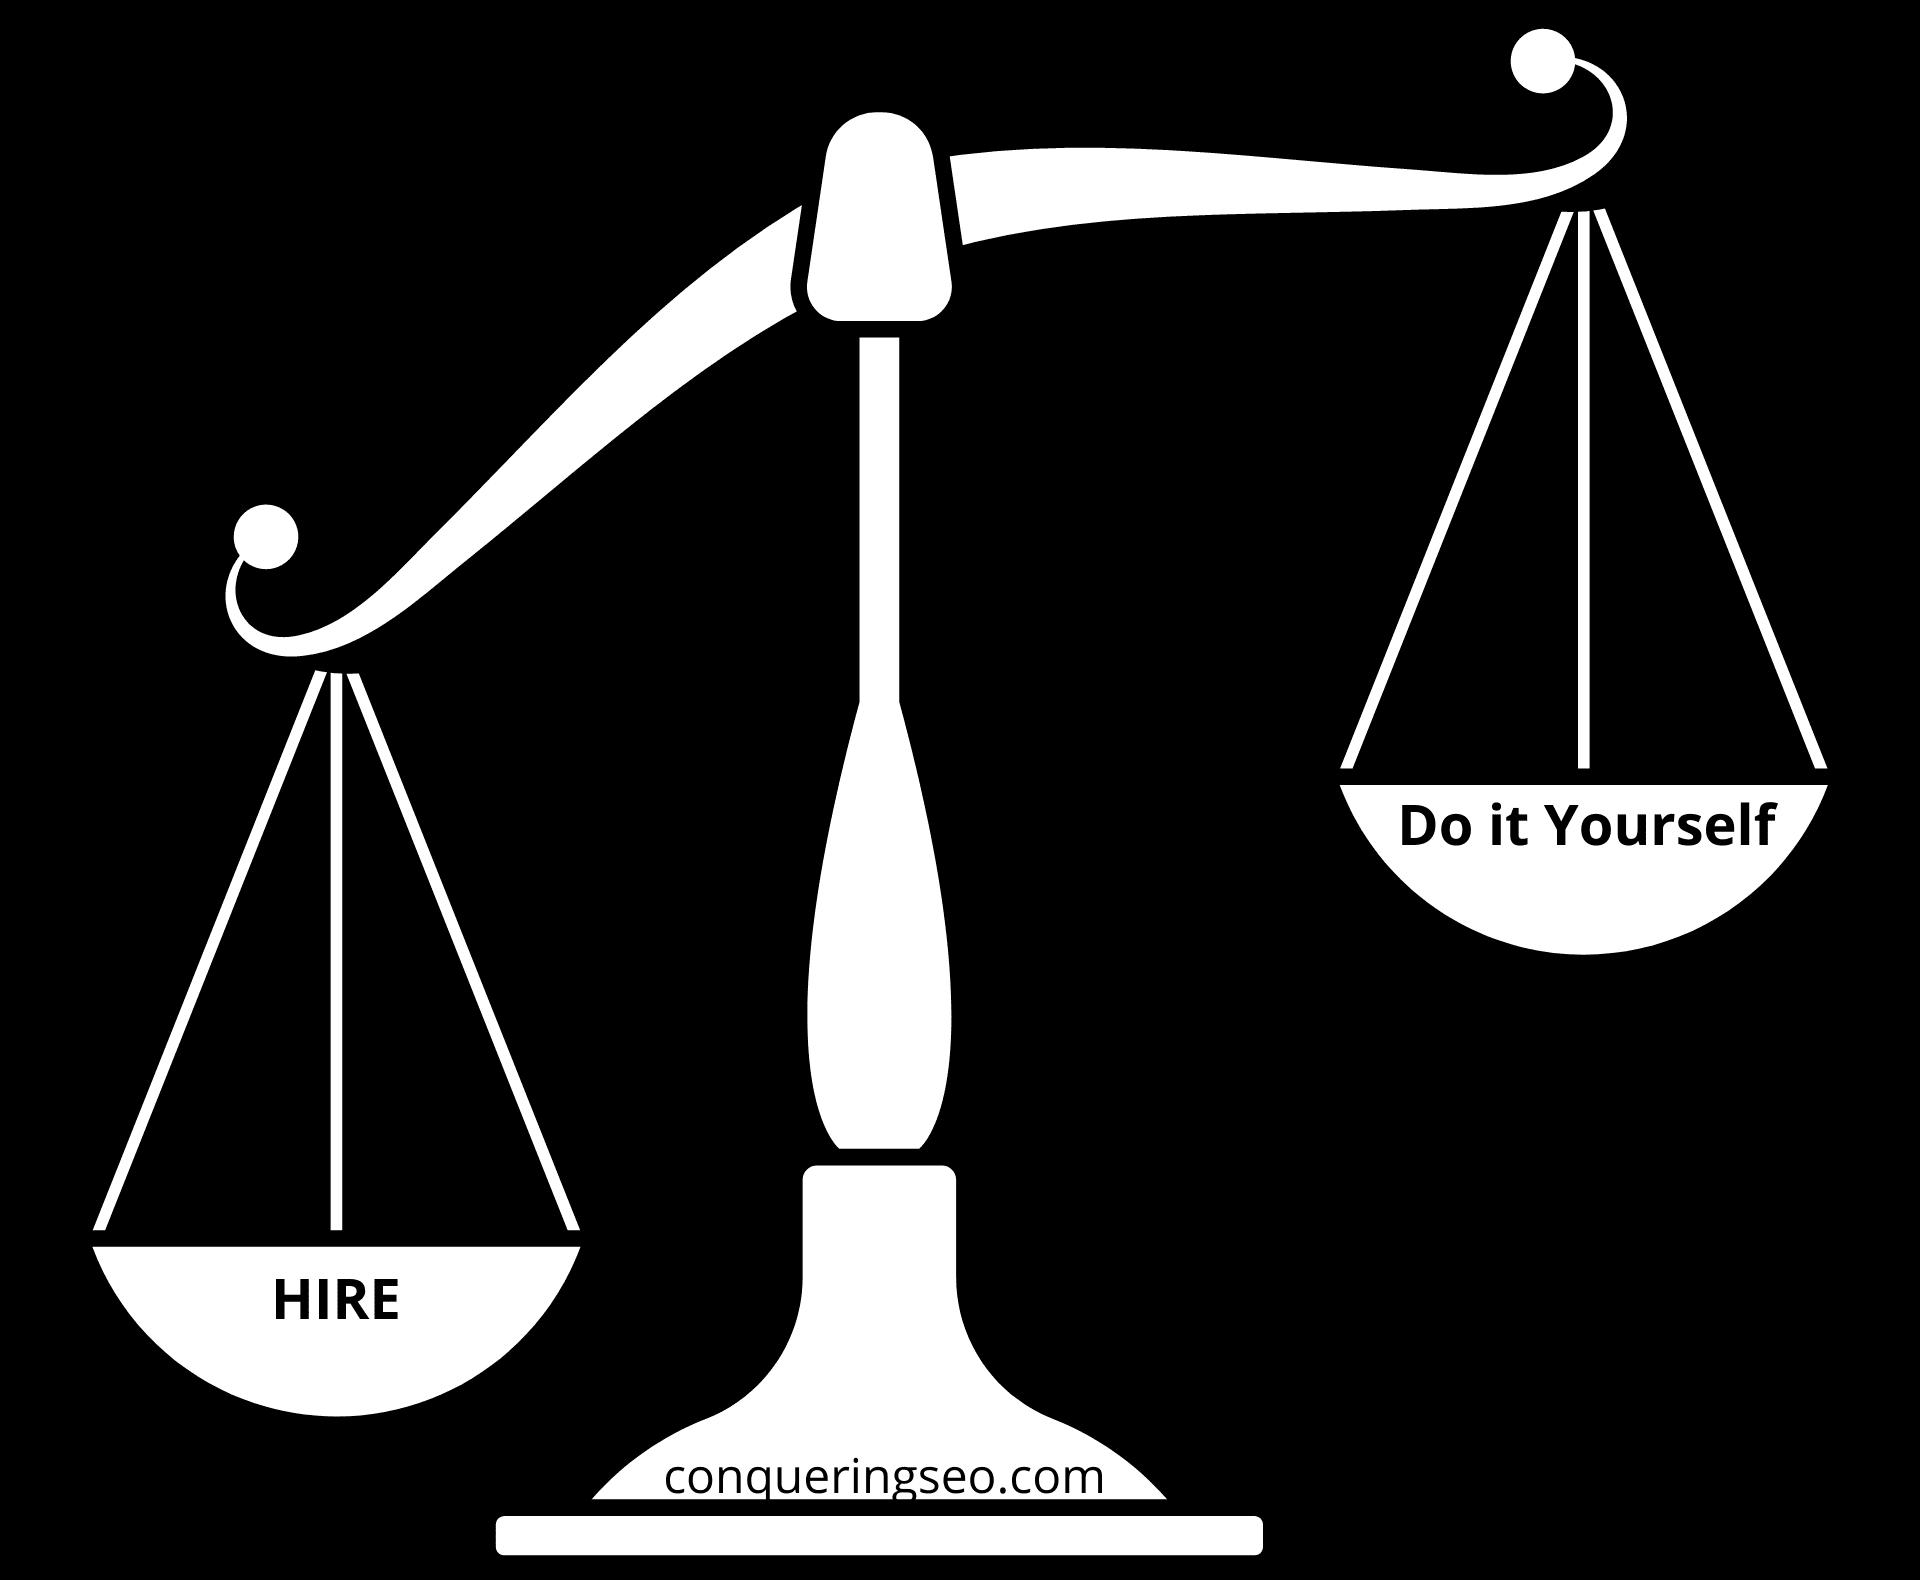 Hiring a Marketing Company Versus Do it Myself